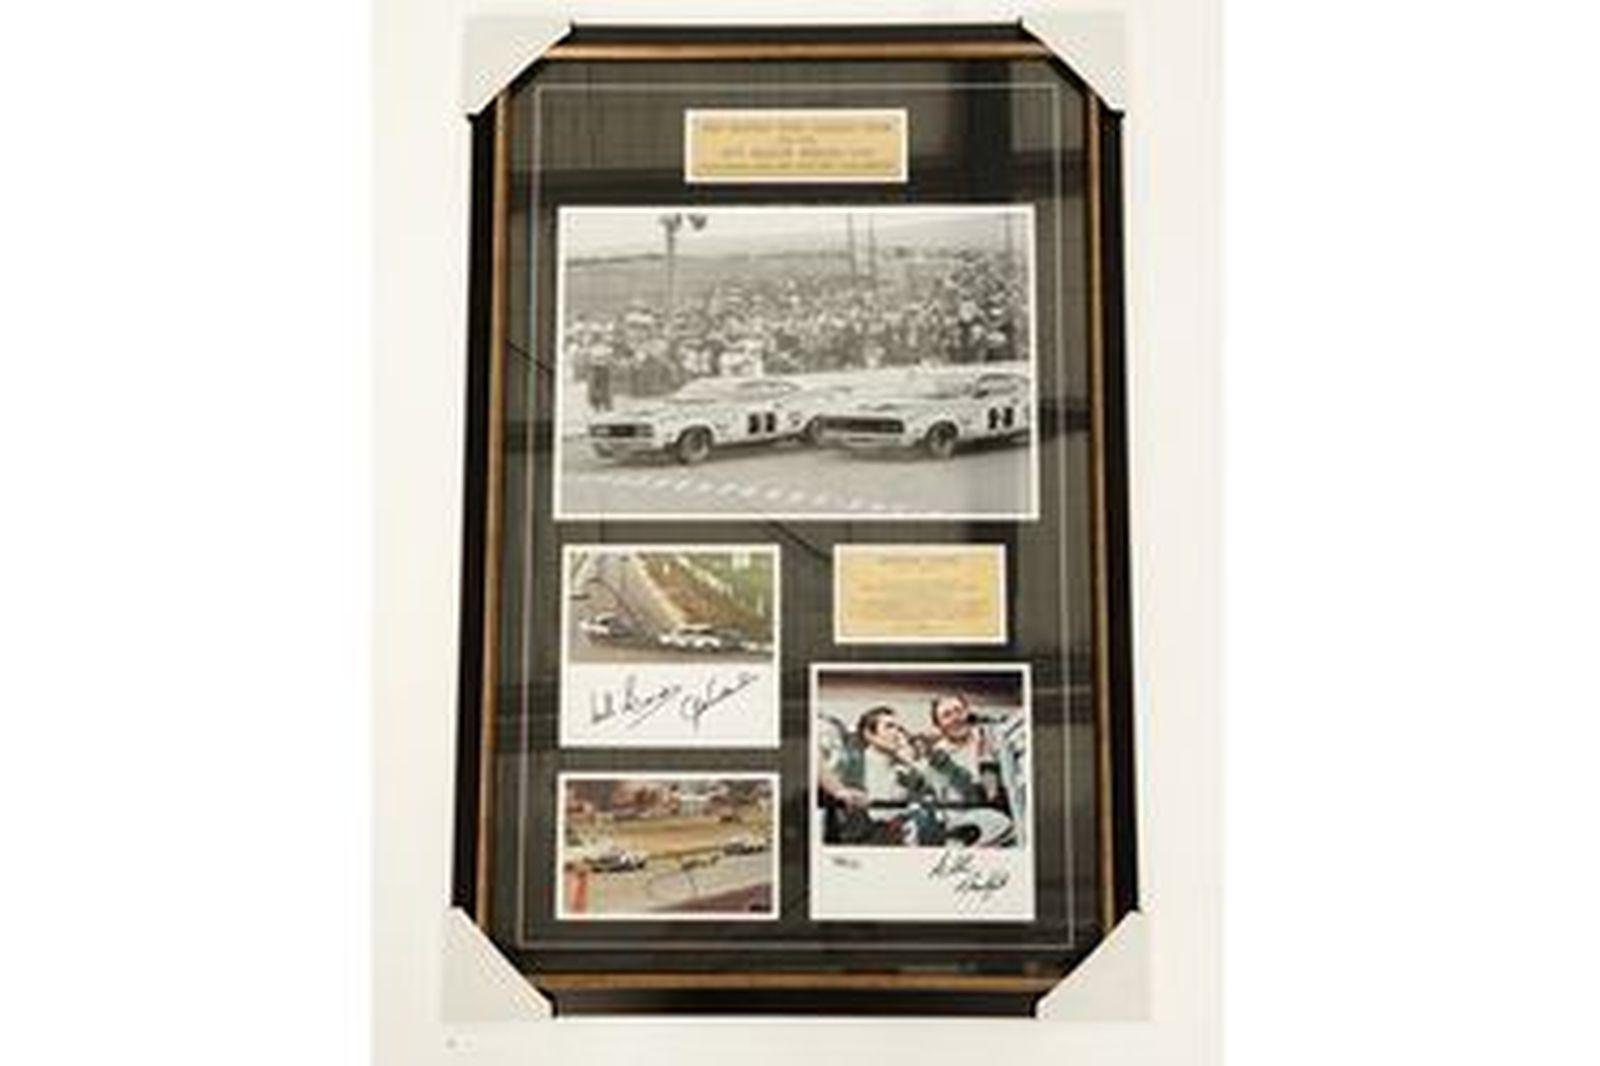 Commemorative Photo Set - Moffat Ford Dealer Team, 1977 Bathurst 1-2 (Autographed By All 4 Drivers)